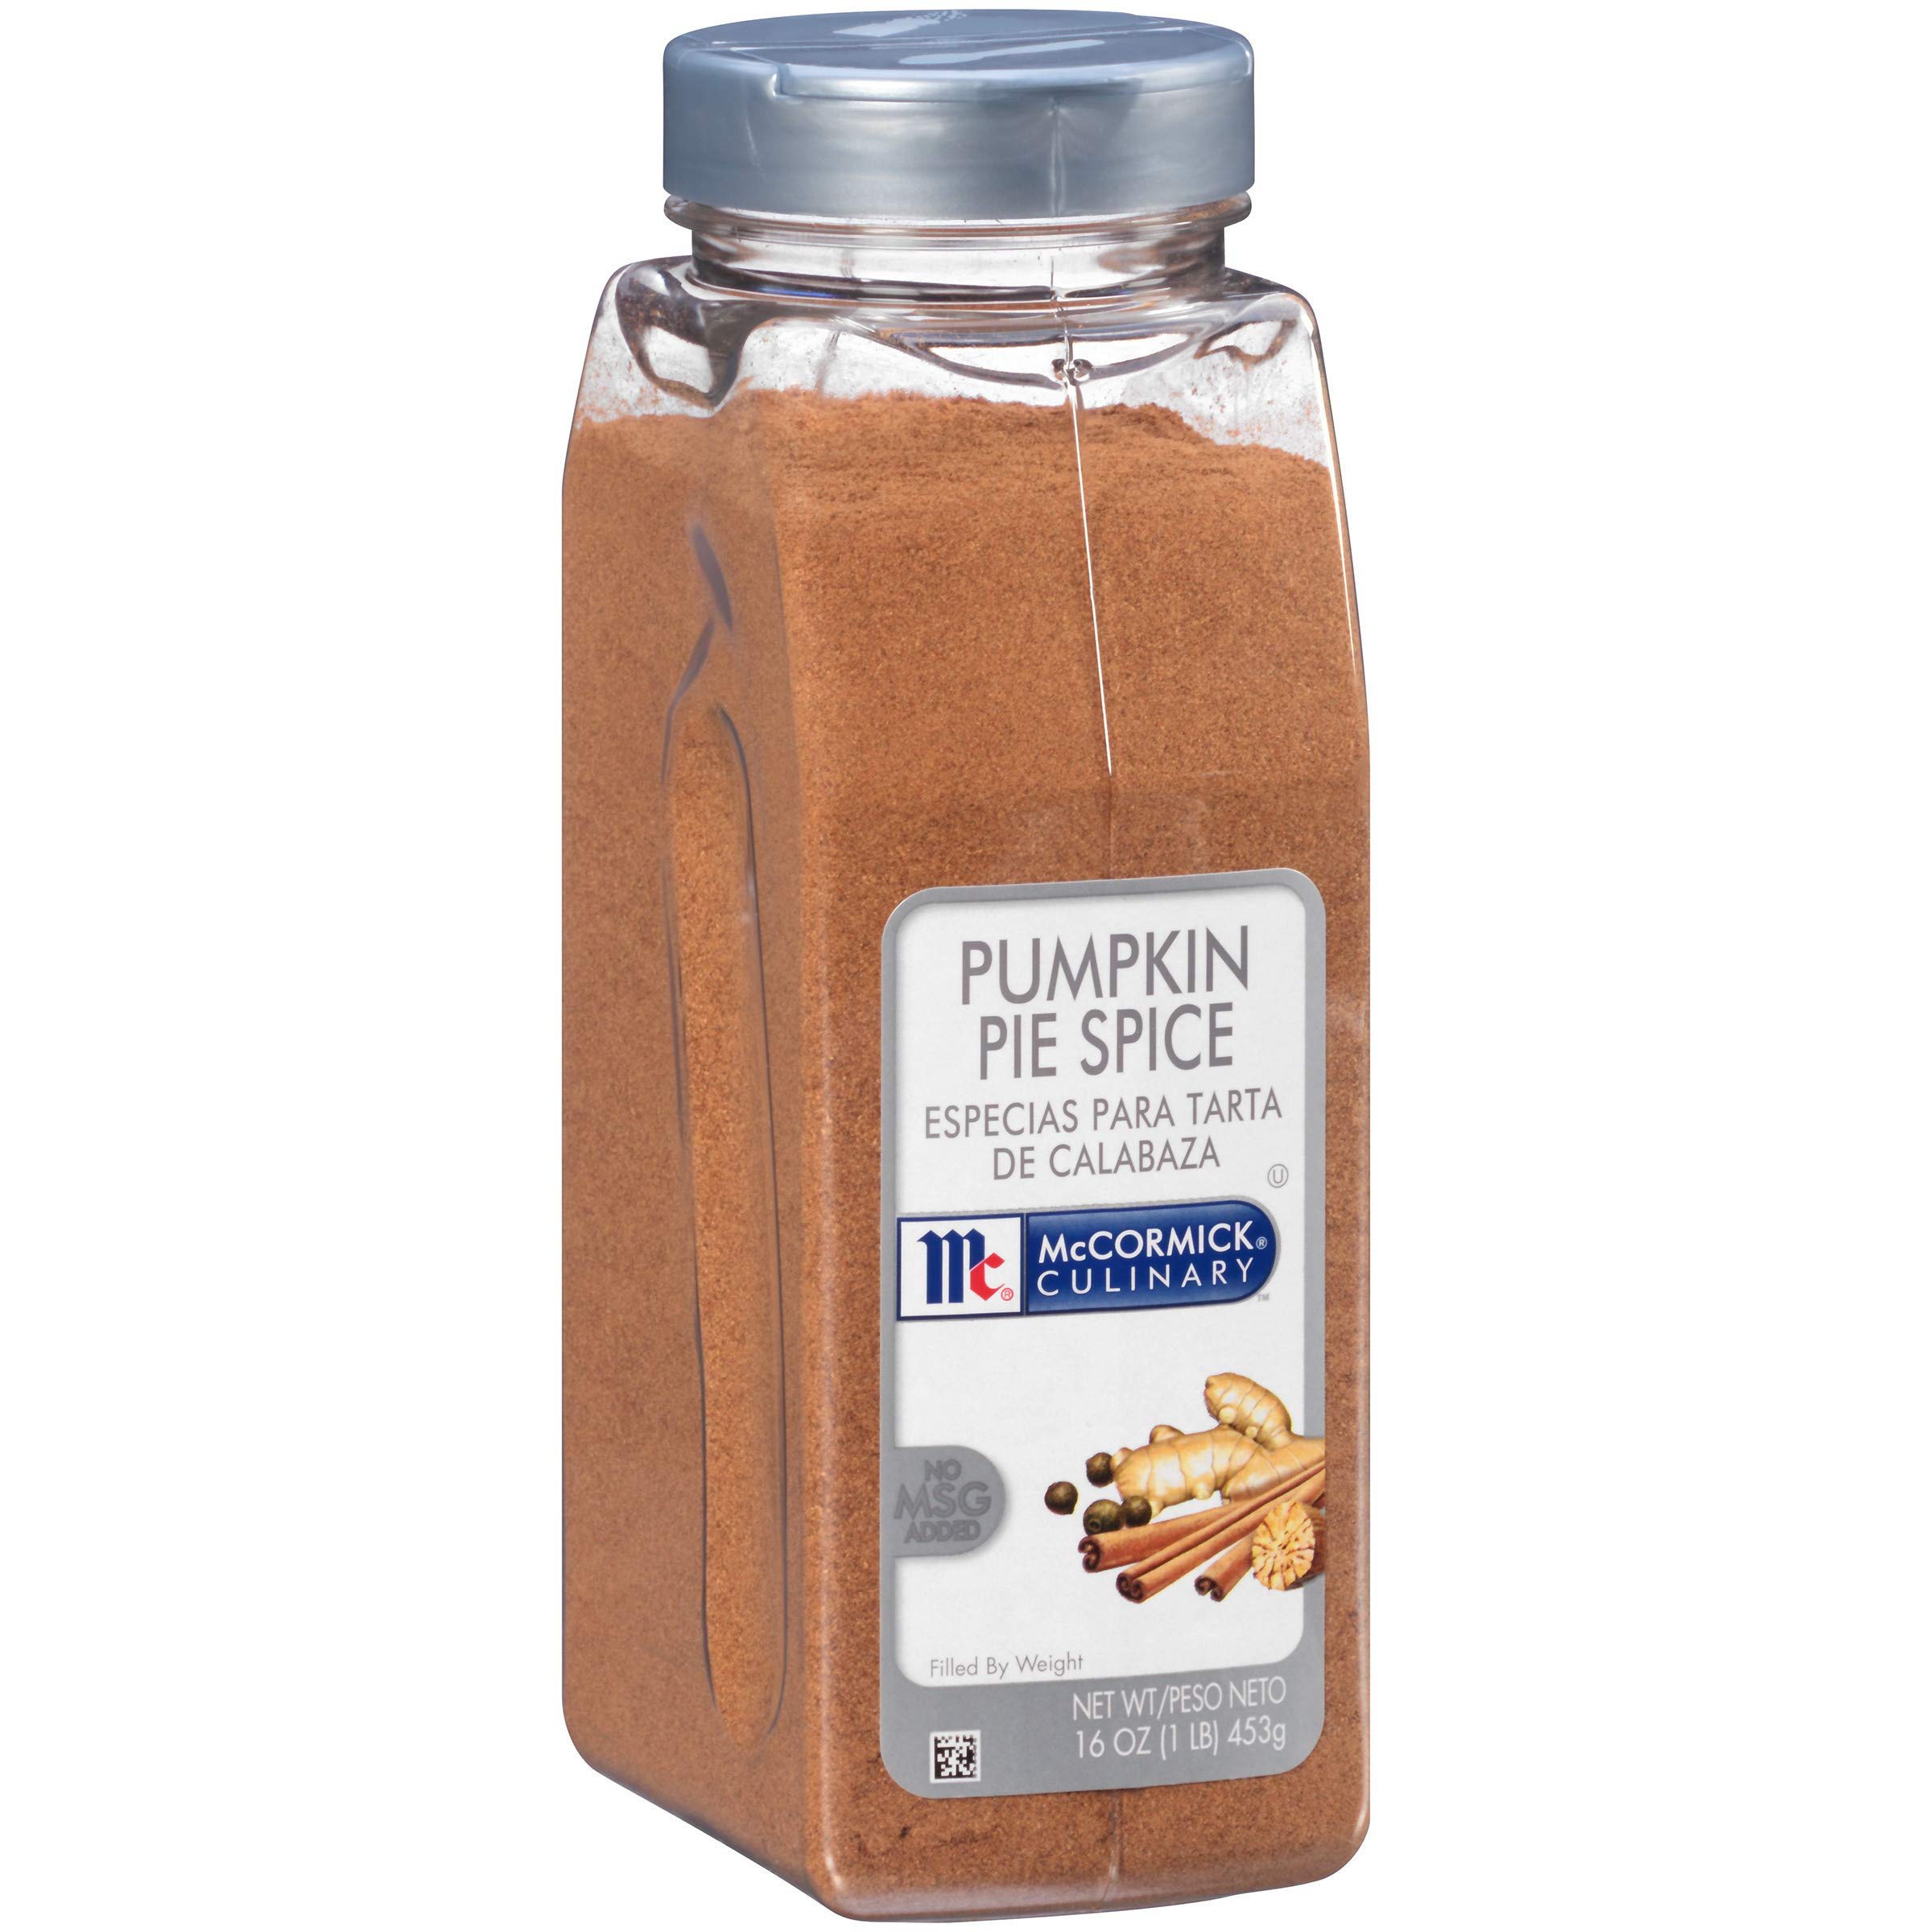 McCormick Culinary Pumpkin Pie Spice, 16 oz